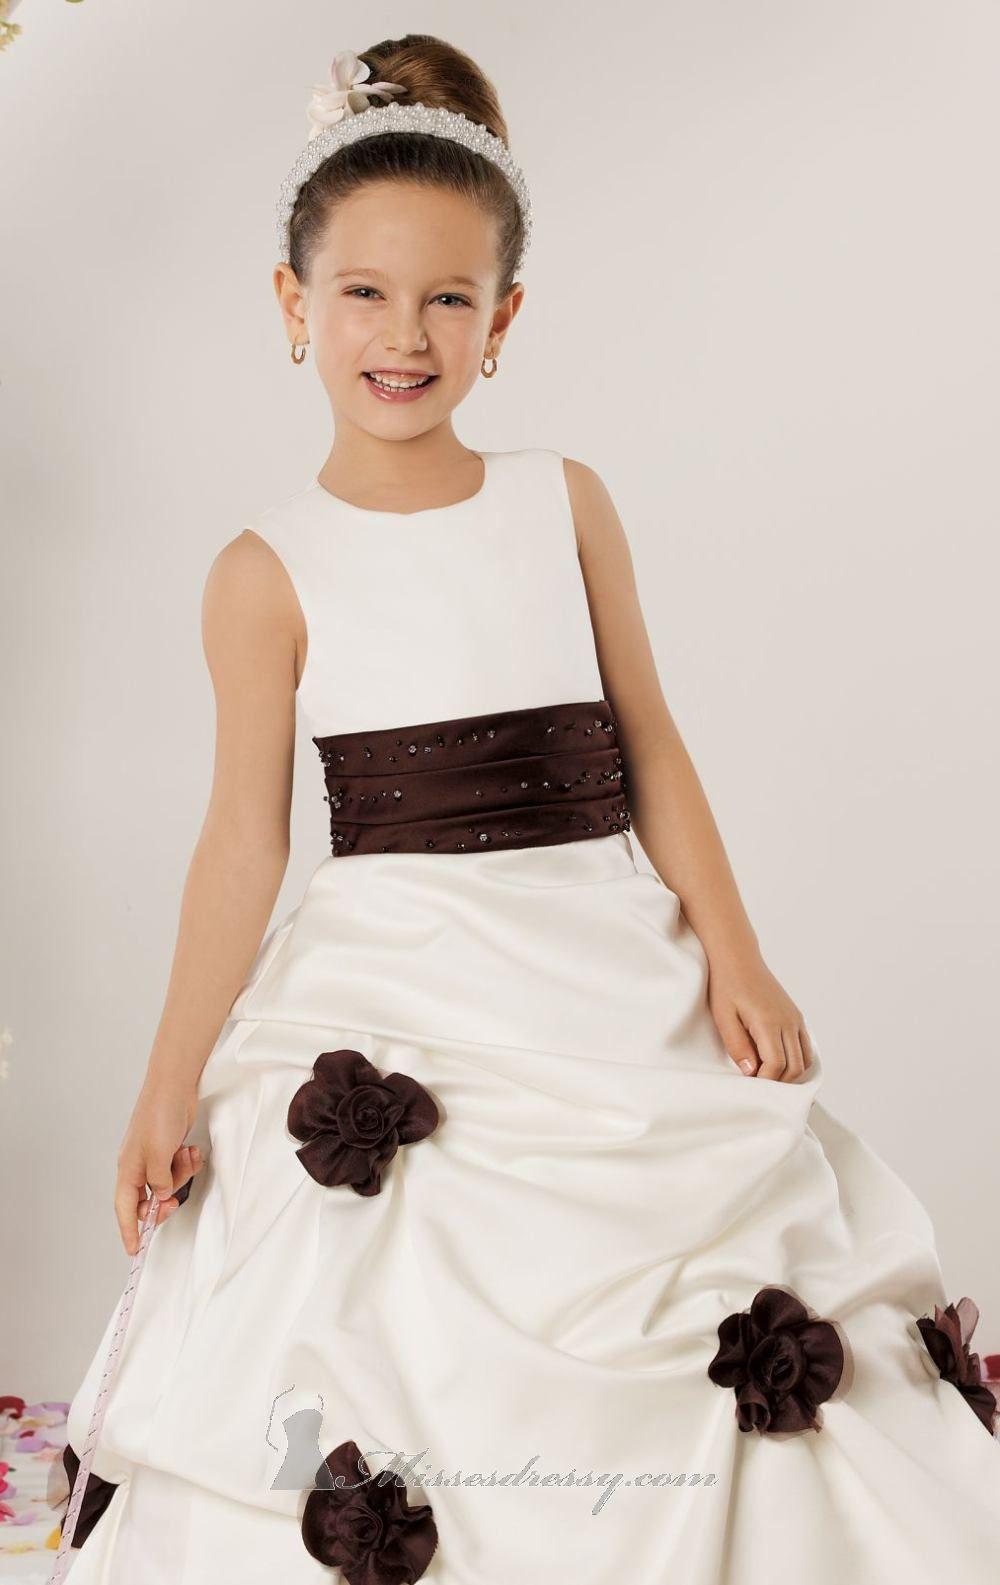 Httpfauxtogojordan l310 dress p 3279ml cherae httpfauxtogojordan l310 dress p junior bridesmaidsempire ombrellifo Images